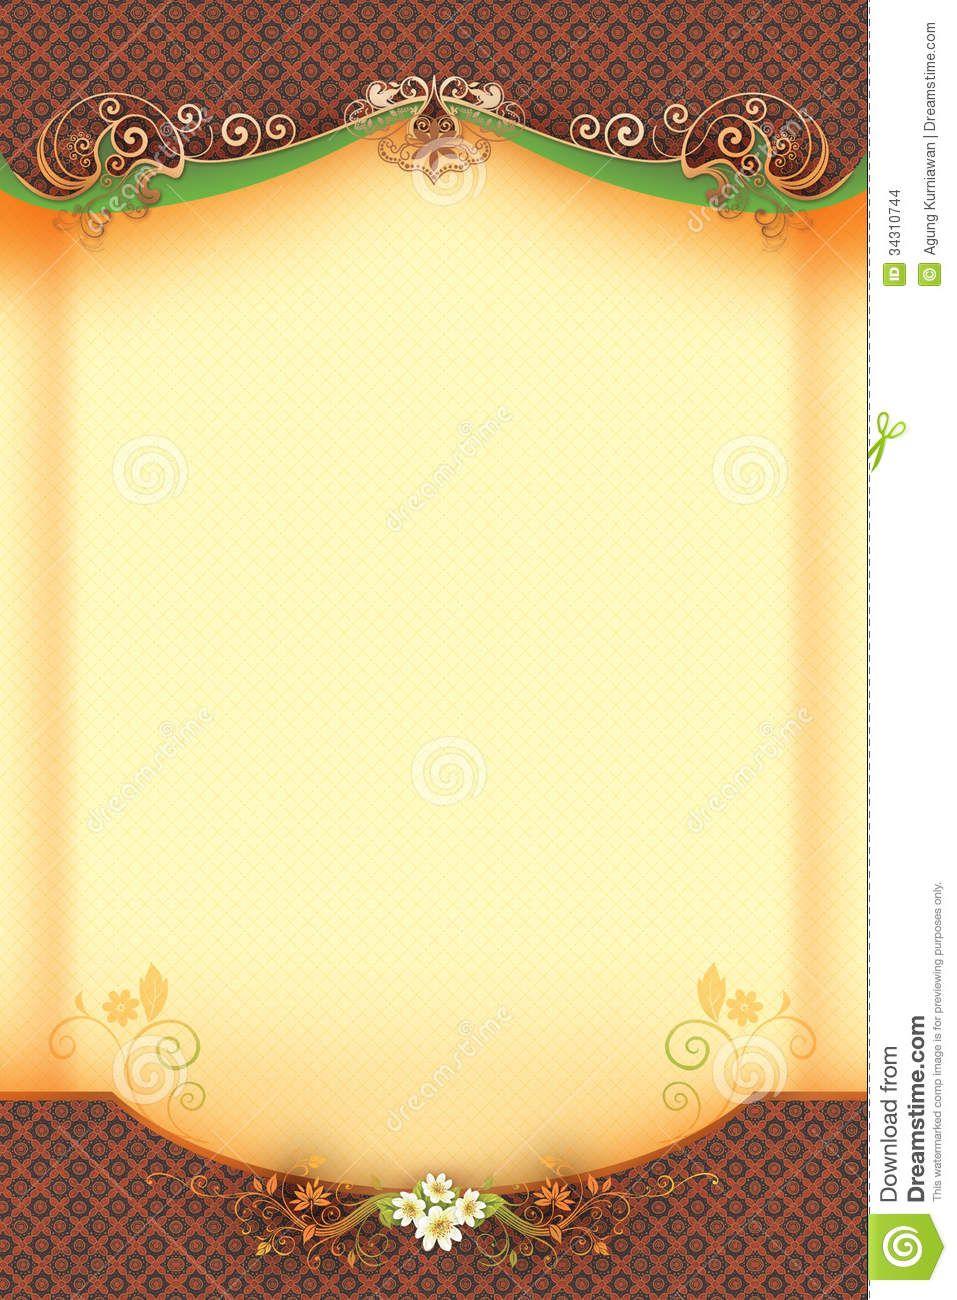 wedding invitations cards background